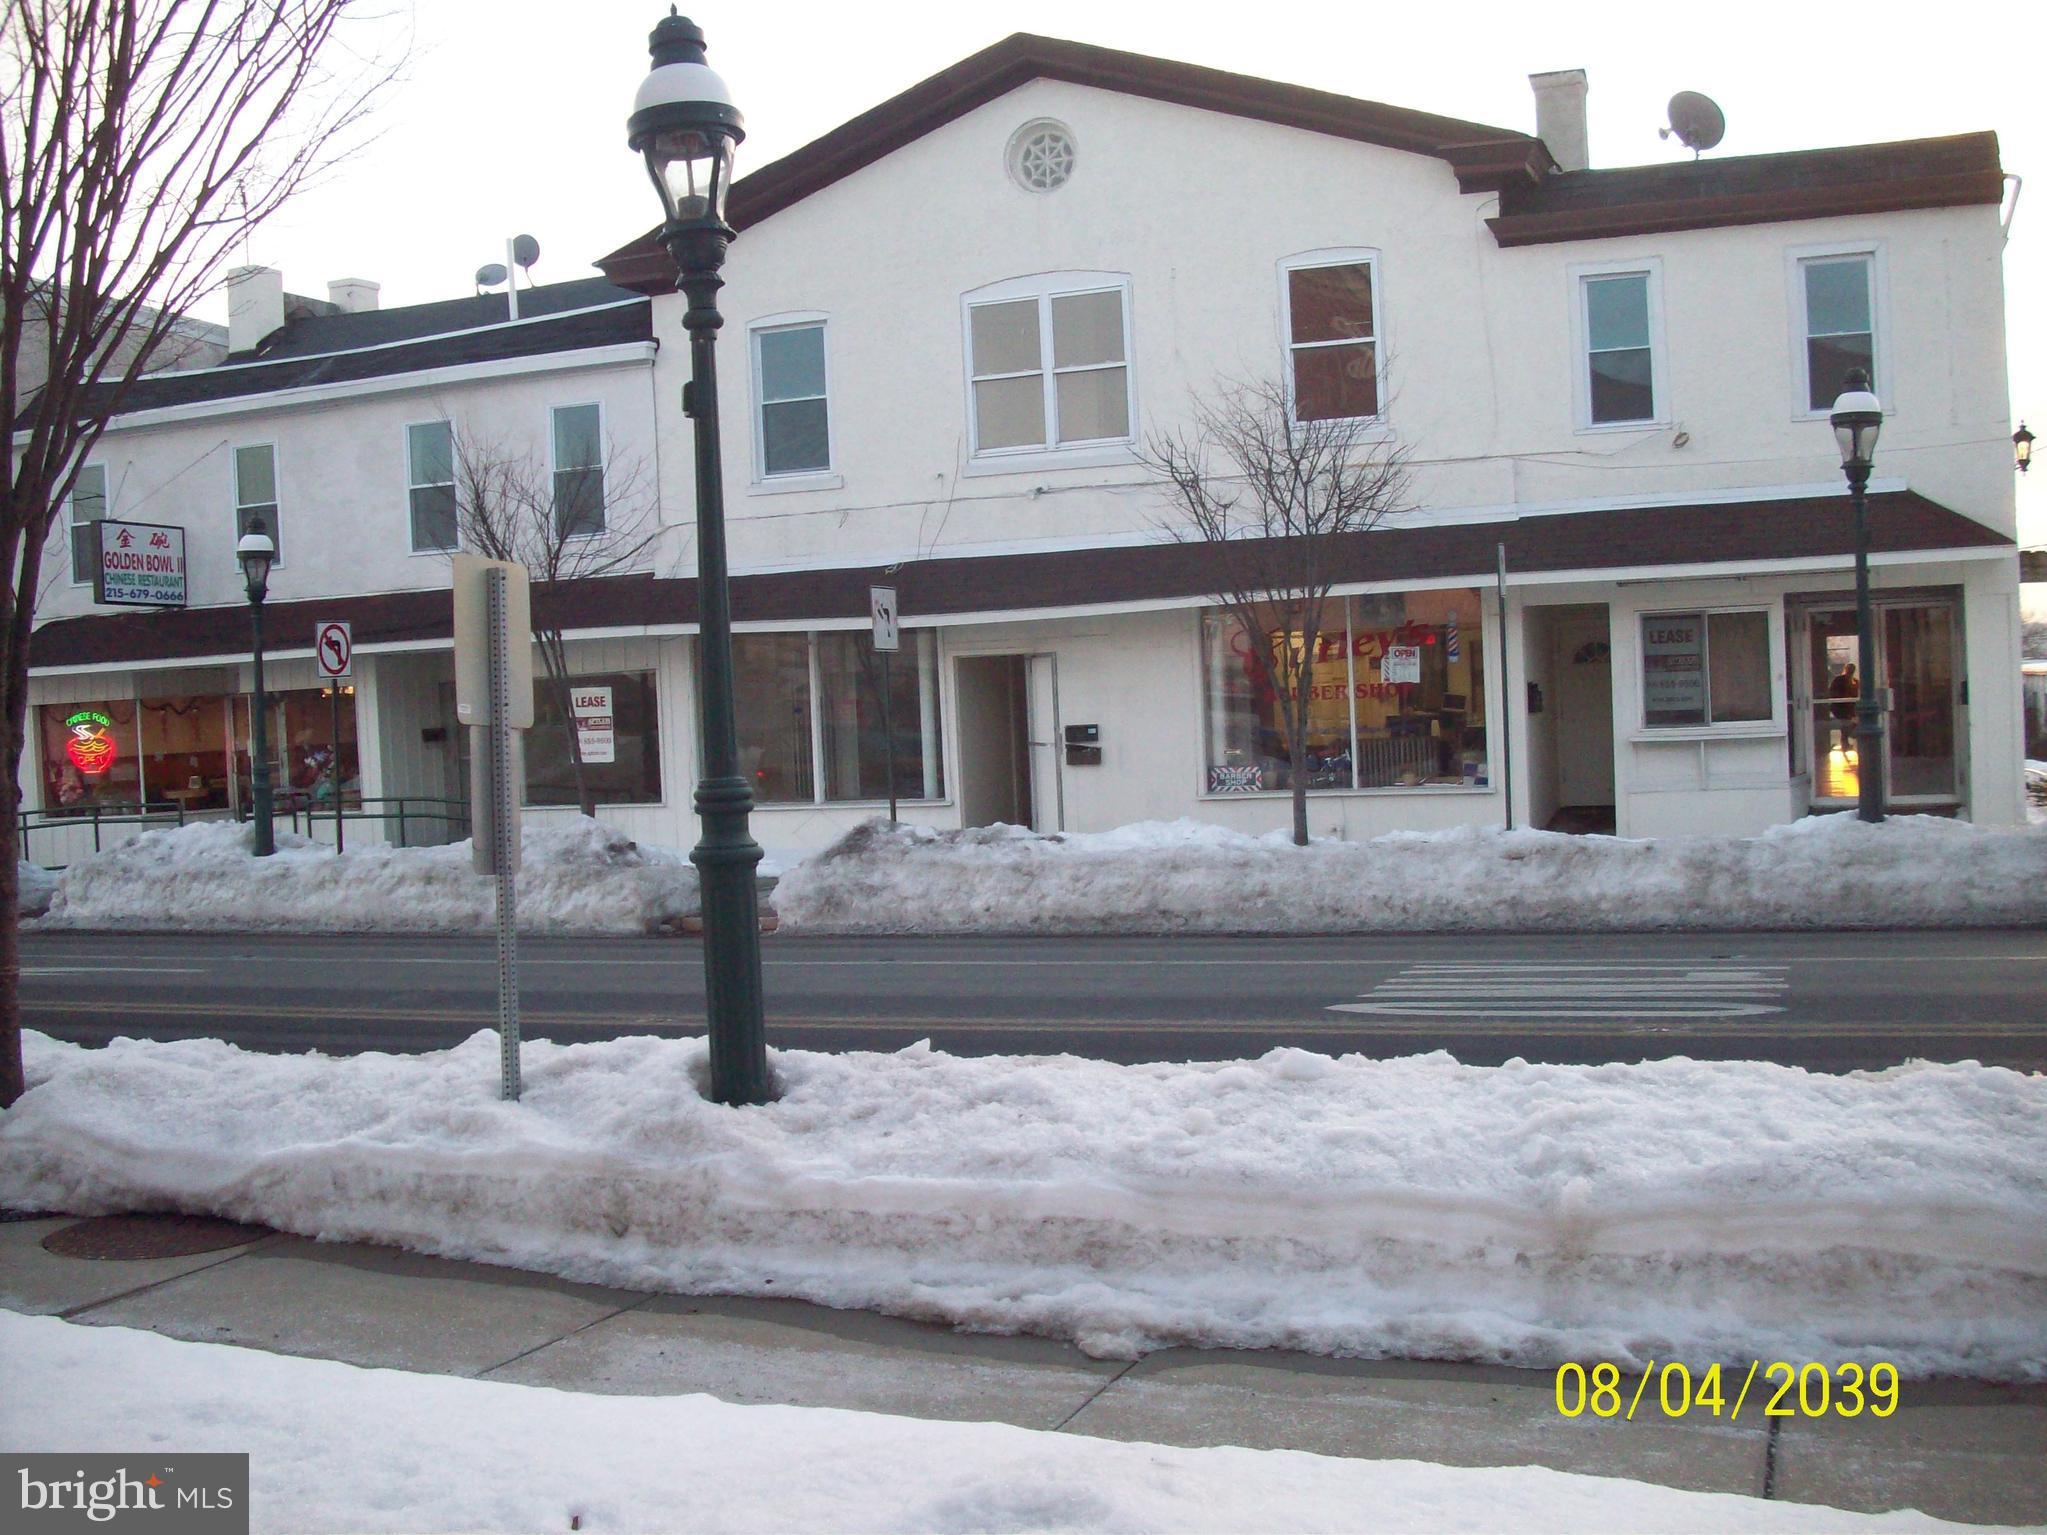 349-357 MAIN STREET, PENNSBURG, PA 18073